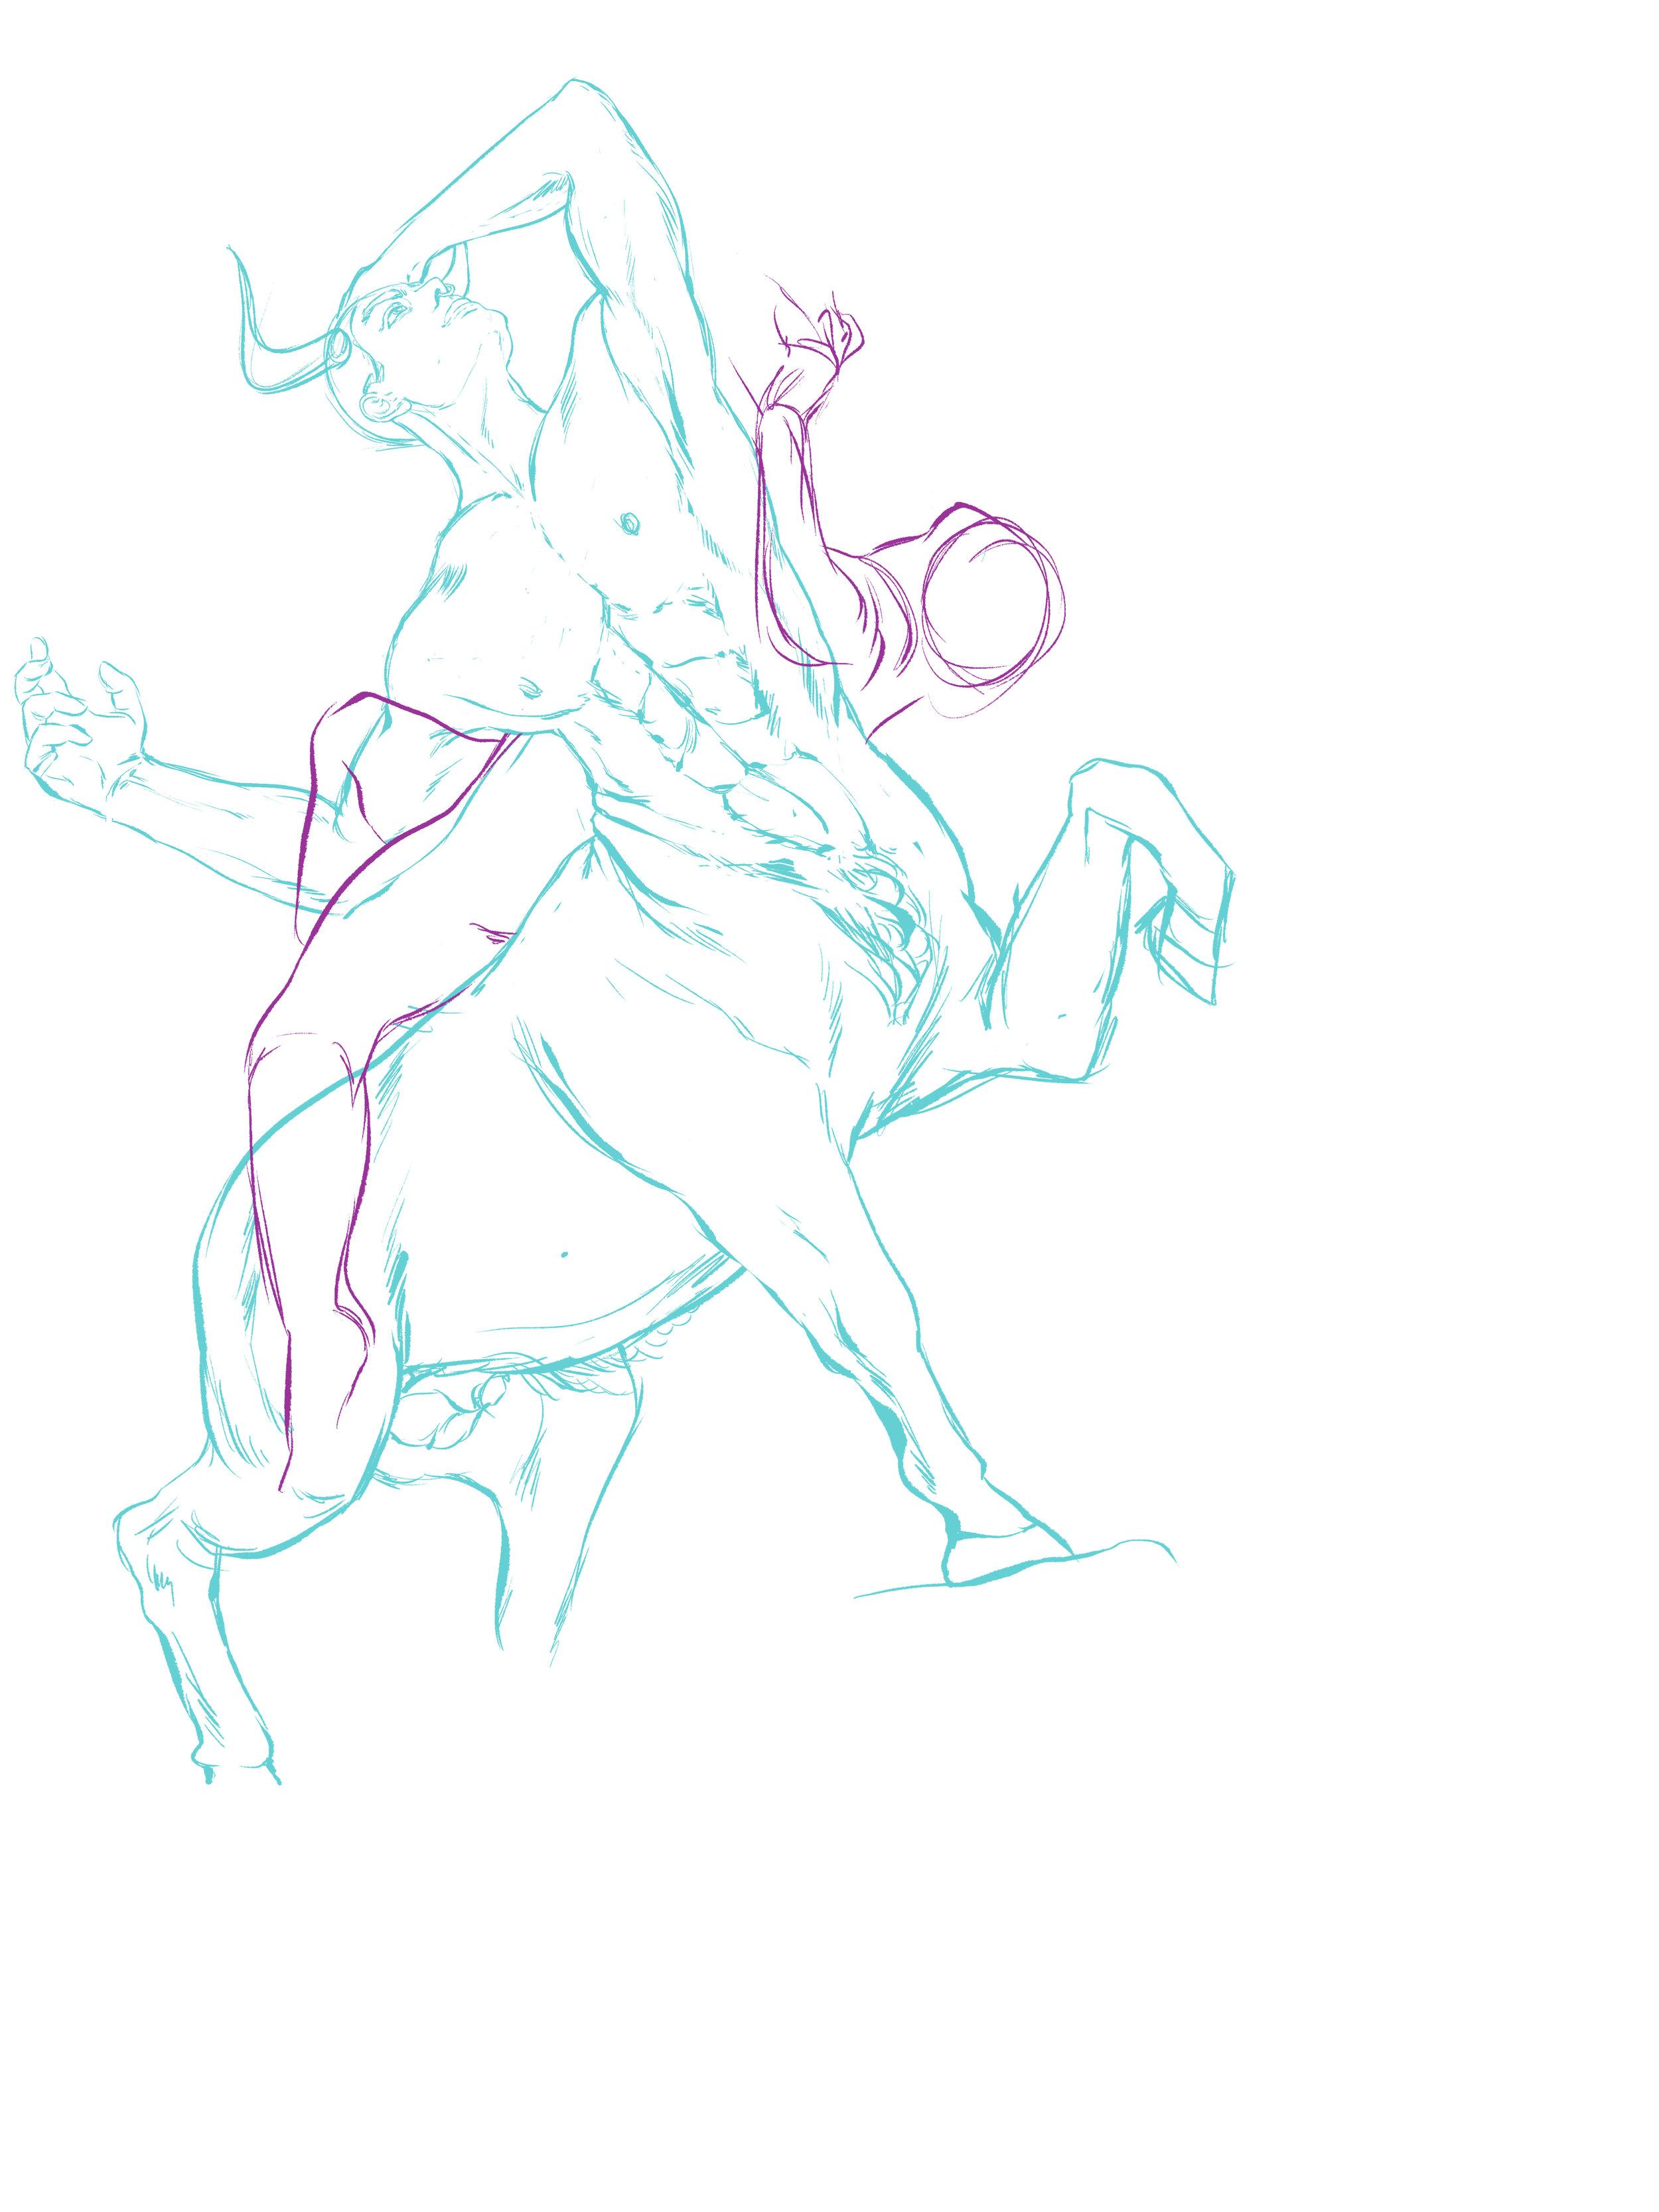 Europa and the Bull3.jpg